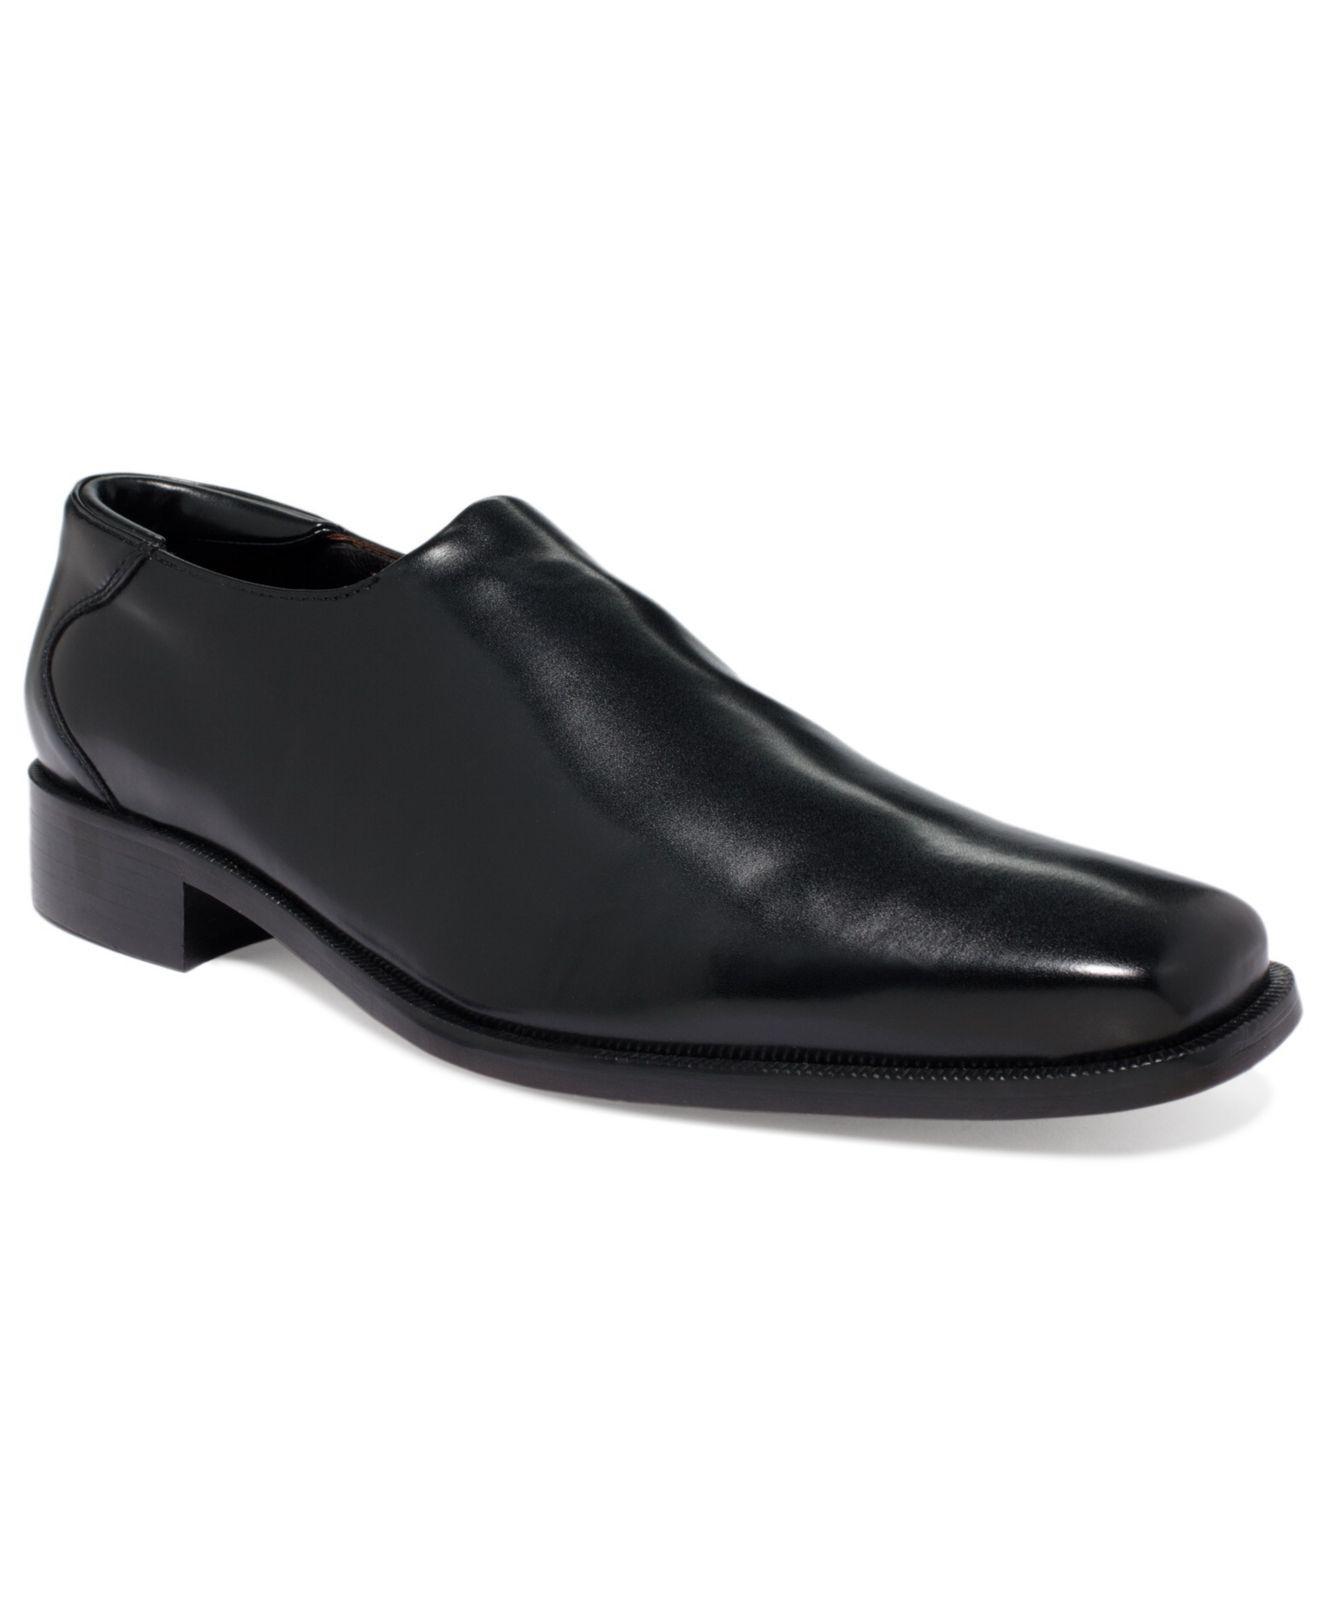 fb8538658a2 Donald J Pliner. Men s Black Shoes